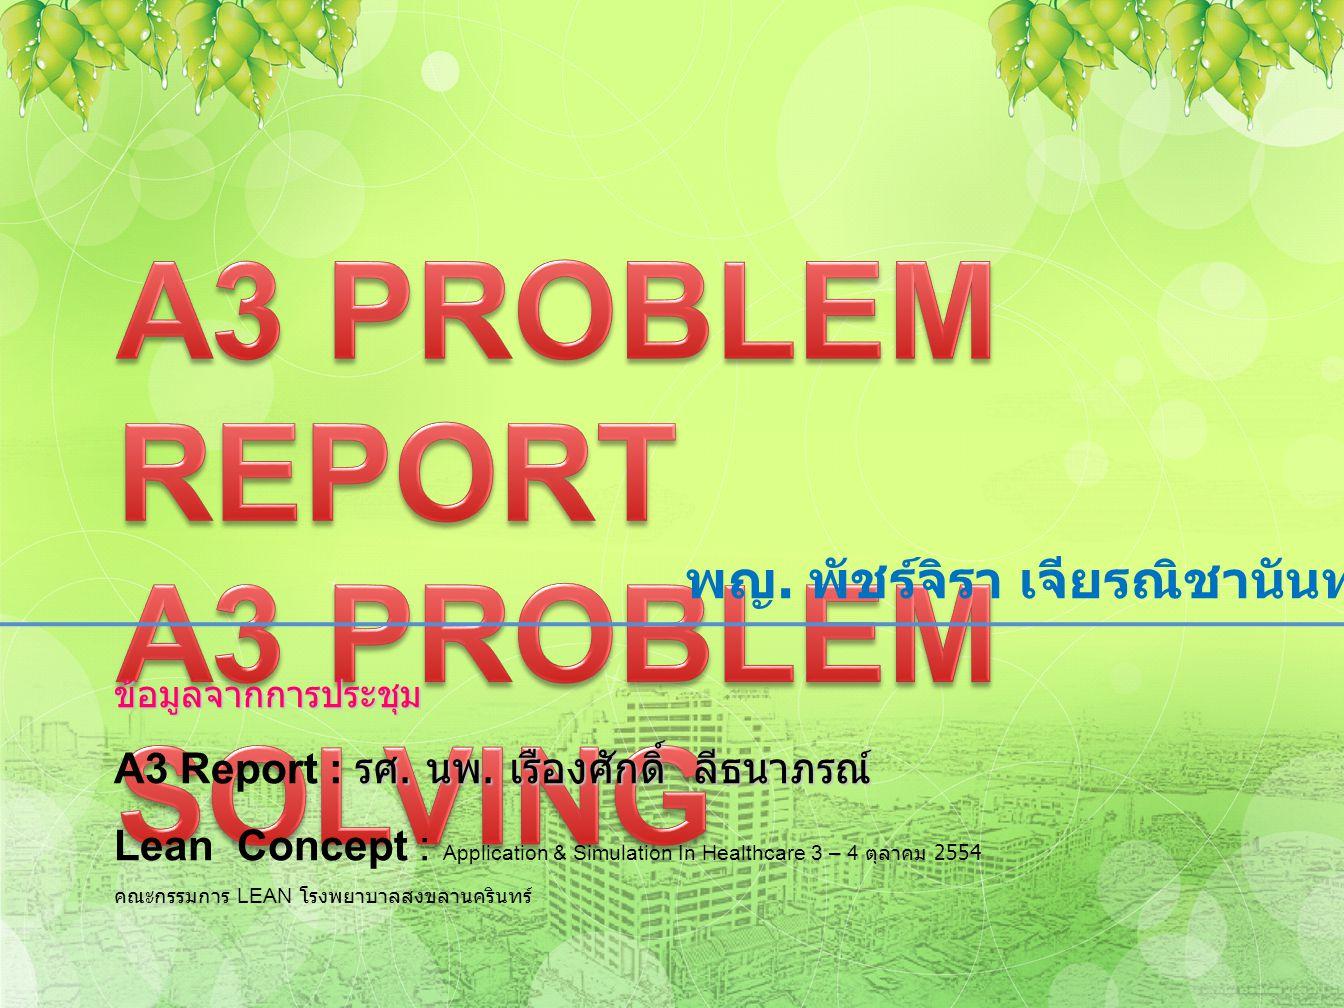 A3 PROBLEM REPORT A3 PROBLEM SOLVING พญ. พัชร์จิรา เจียรณิชานันท์